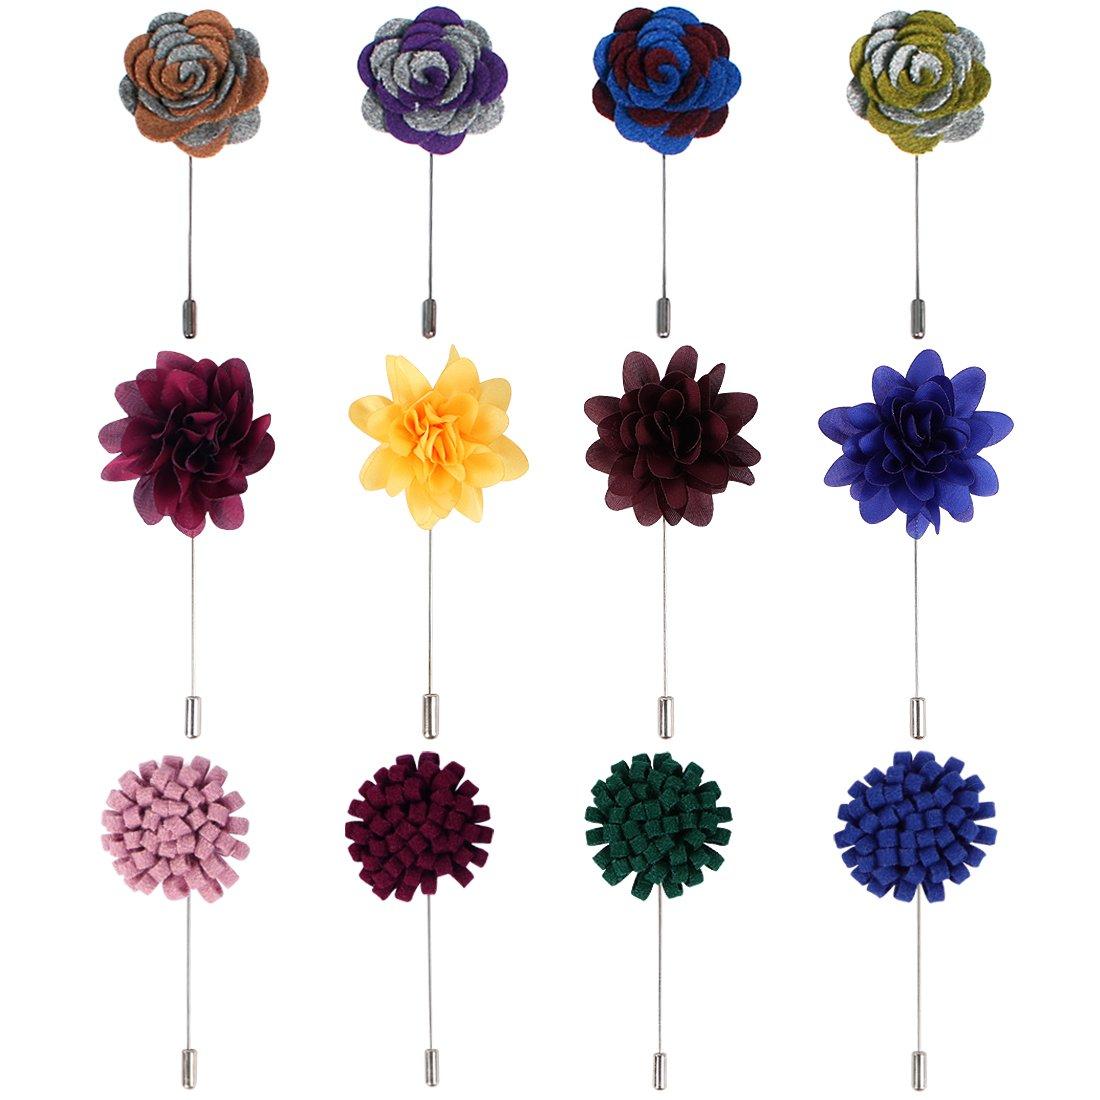 kilofly Men's Flower Lapel Pin Wedding Suit Boutonniere Stick, Set of 12 AMA317set12B